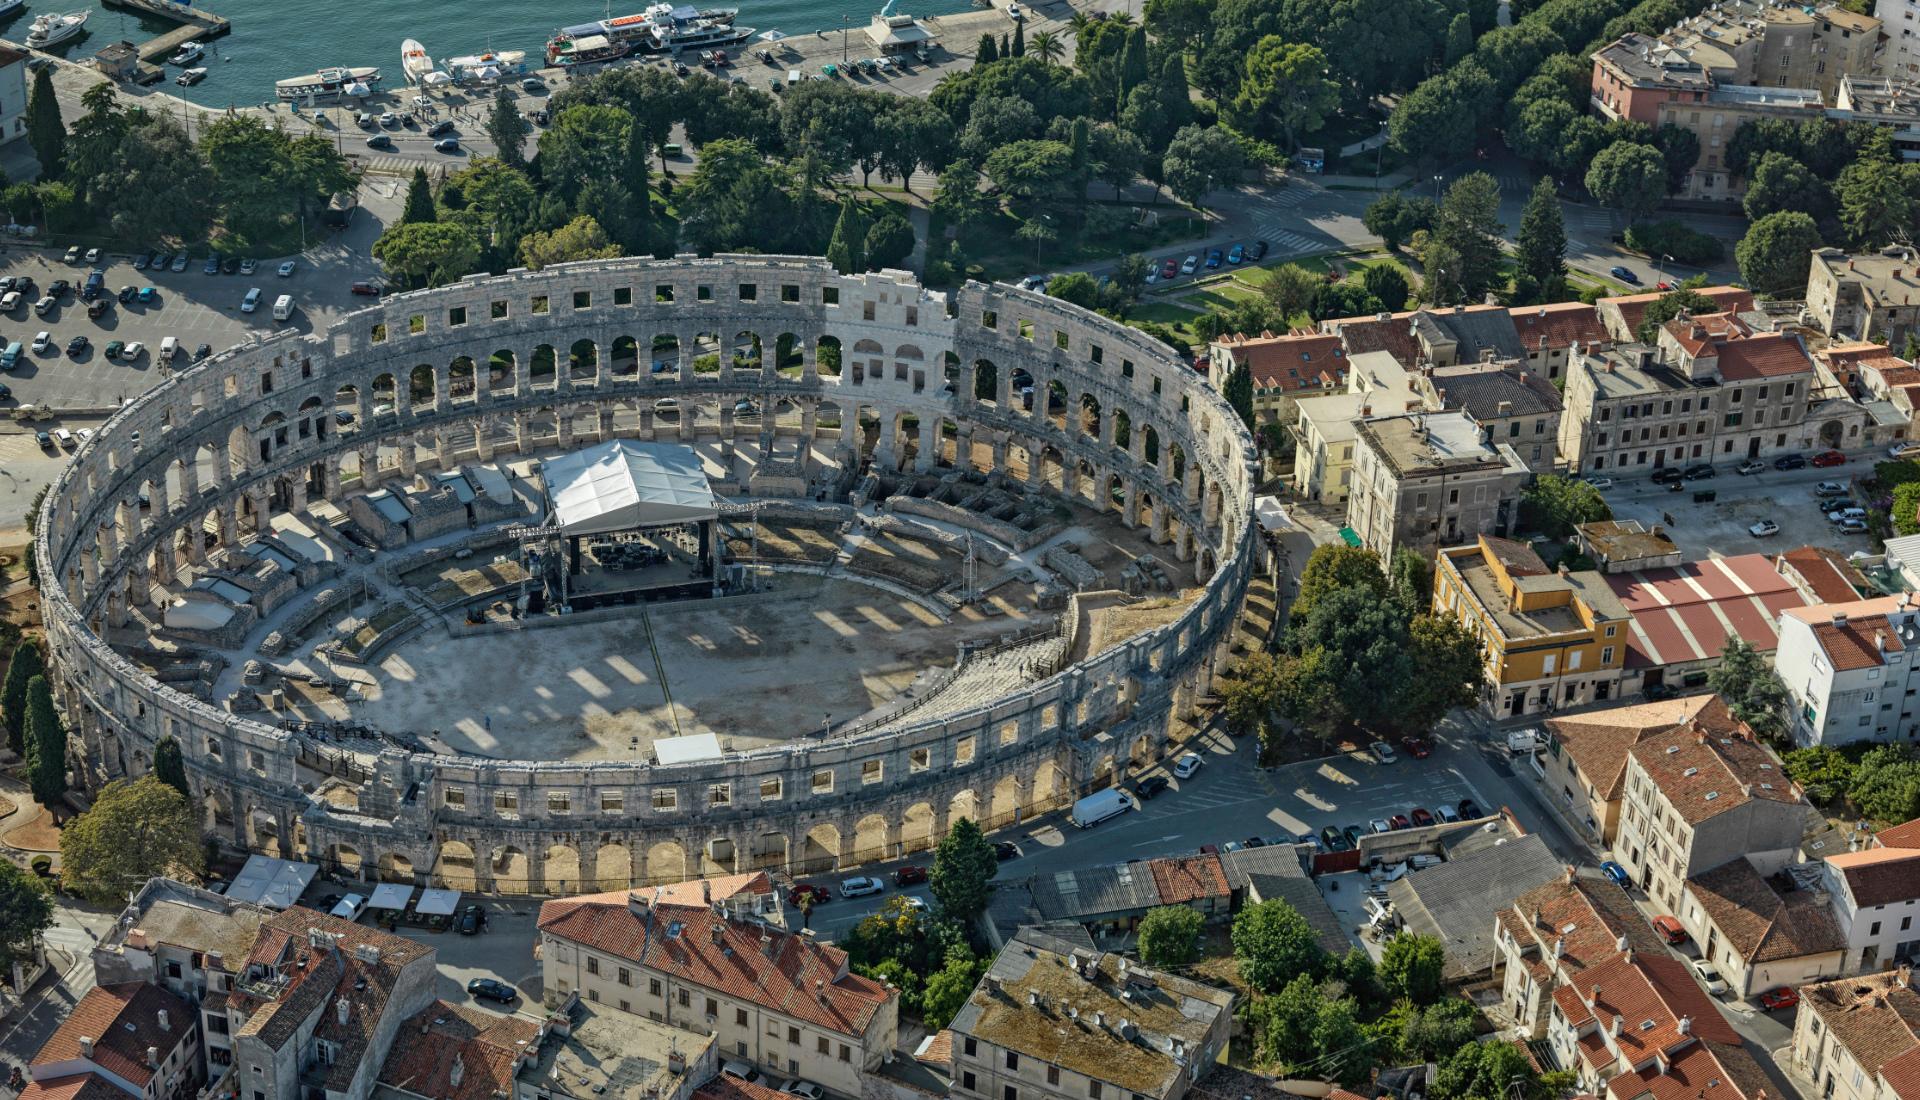 Chorvatsko-Pula-Koloseum - Letova fotografie - Miroslav Kamrla - 2- 1920x1110_1